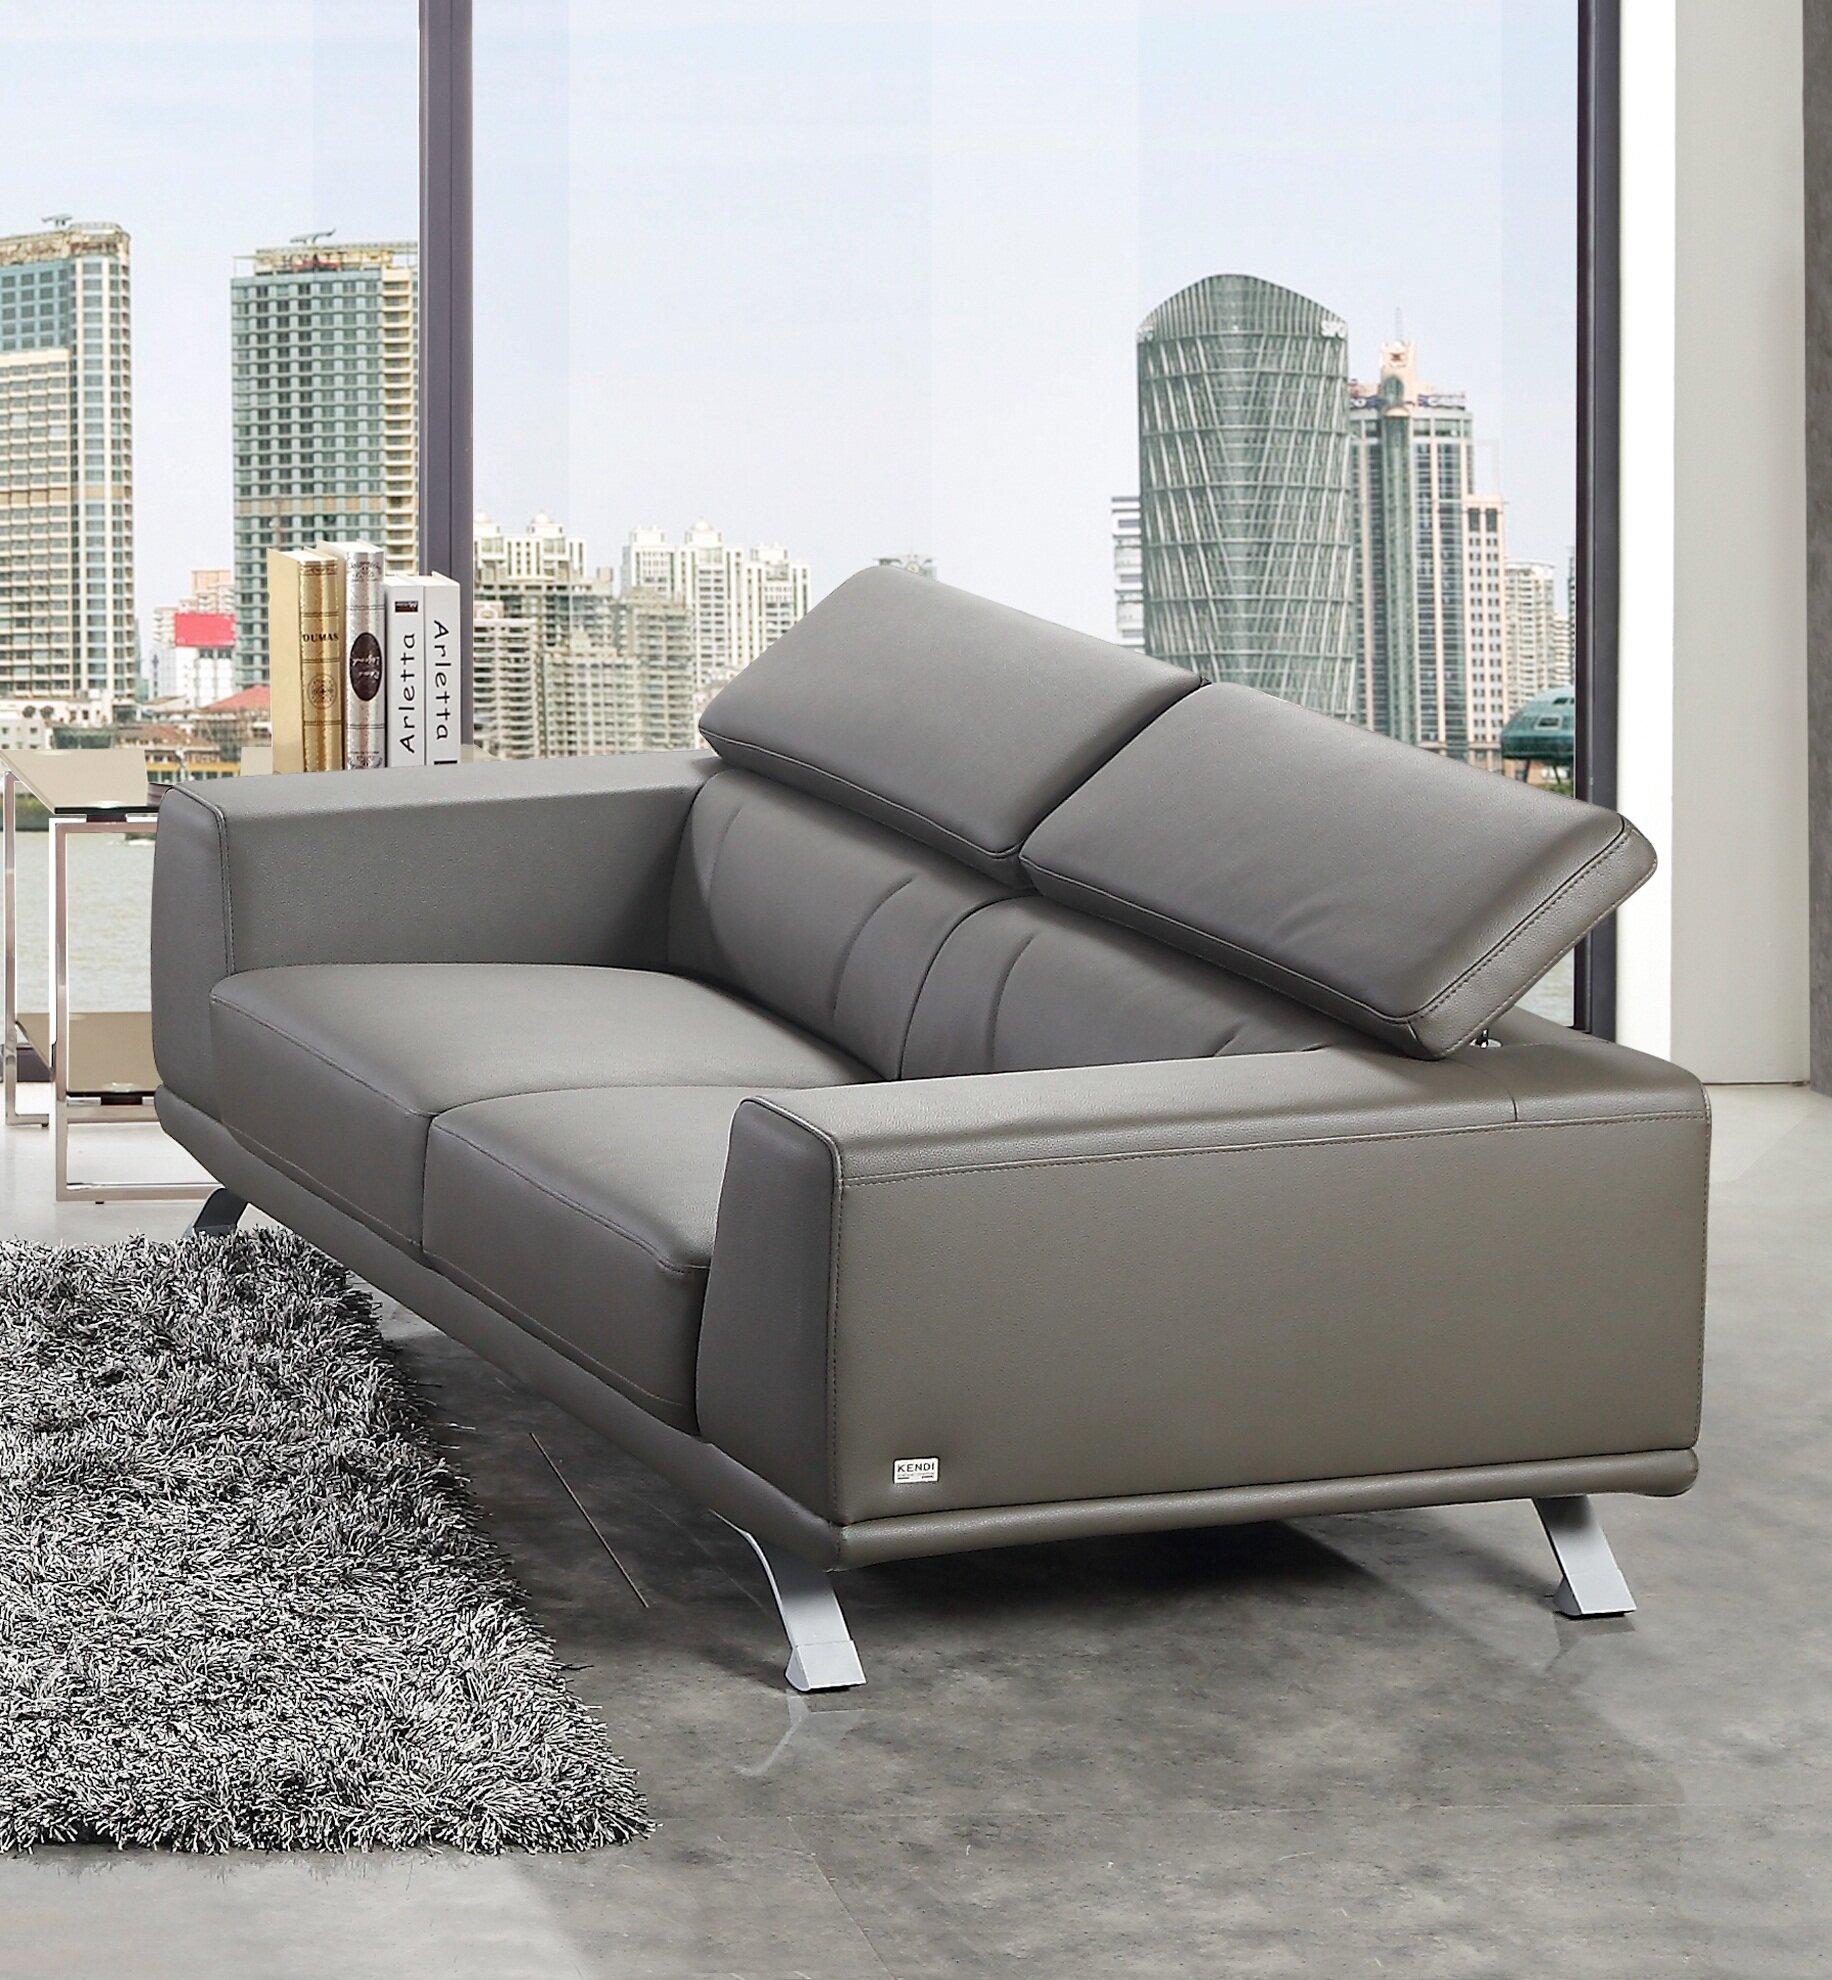 Tremendous Wade Logan Rhea Eco Leather Sofa Wayfair Beatyapartments Chair Design Images Beatyapartmentscom